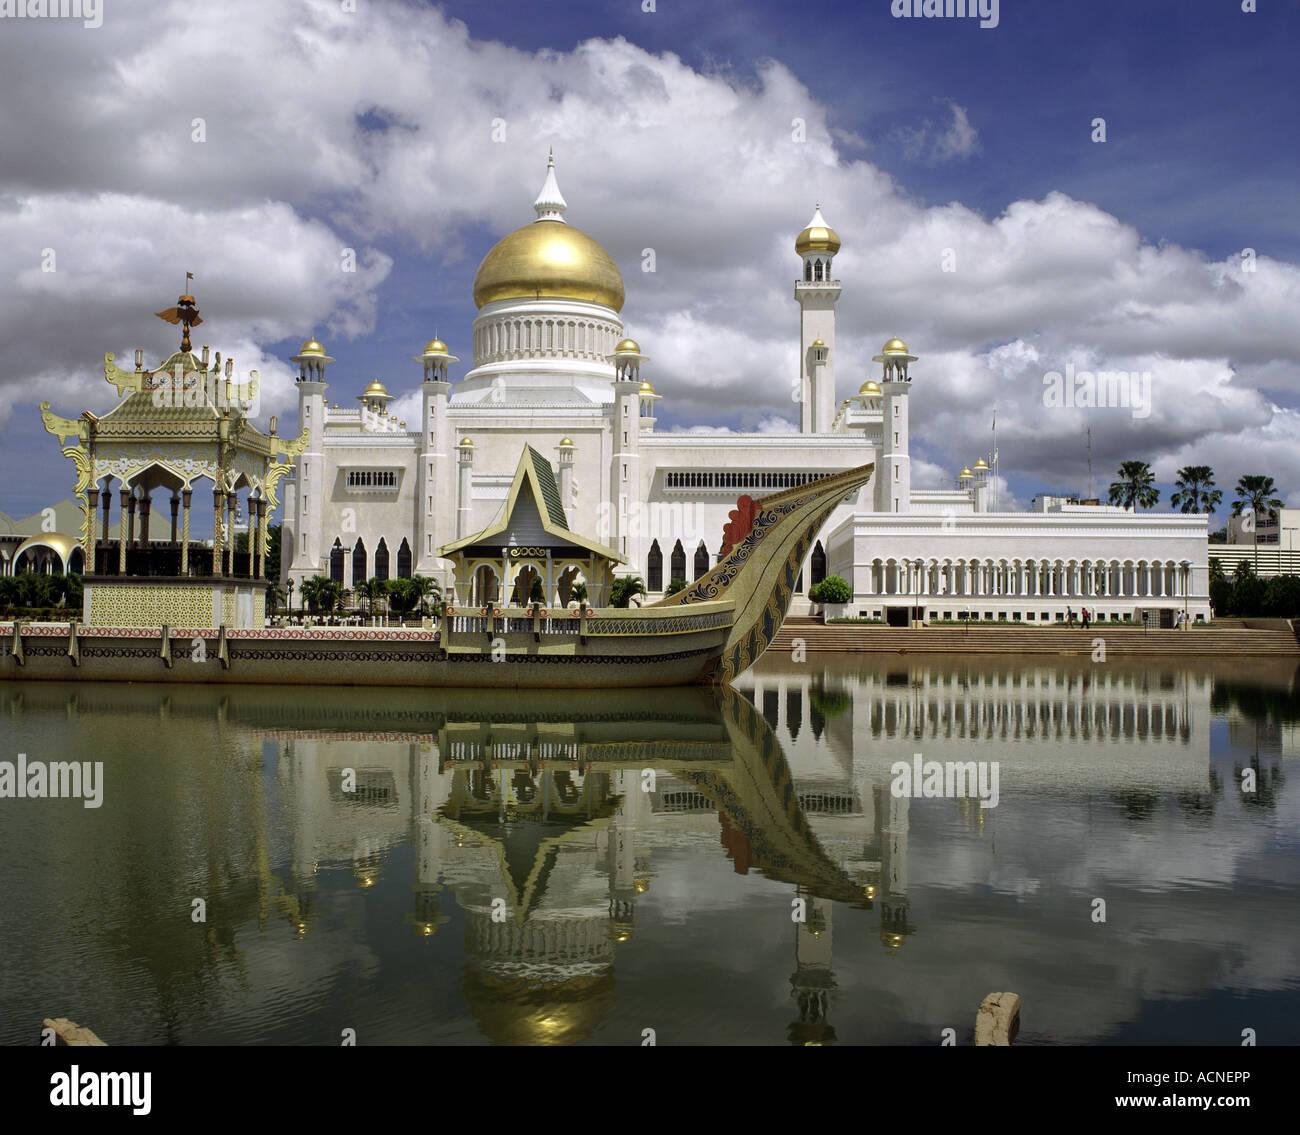 geography / travel, Brunei, Bandar Seri Begawan, buildings, Sultan Omar Ali Saifuddien Mosque, exterior view, Additional - Stock Image